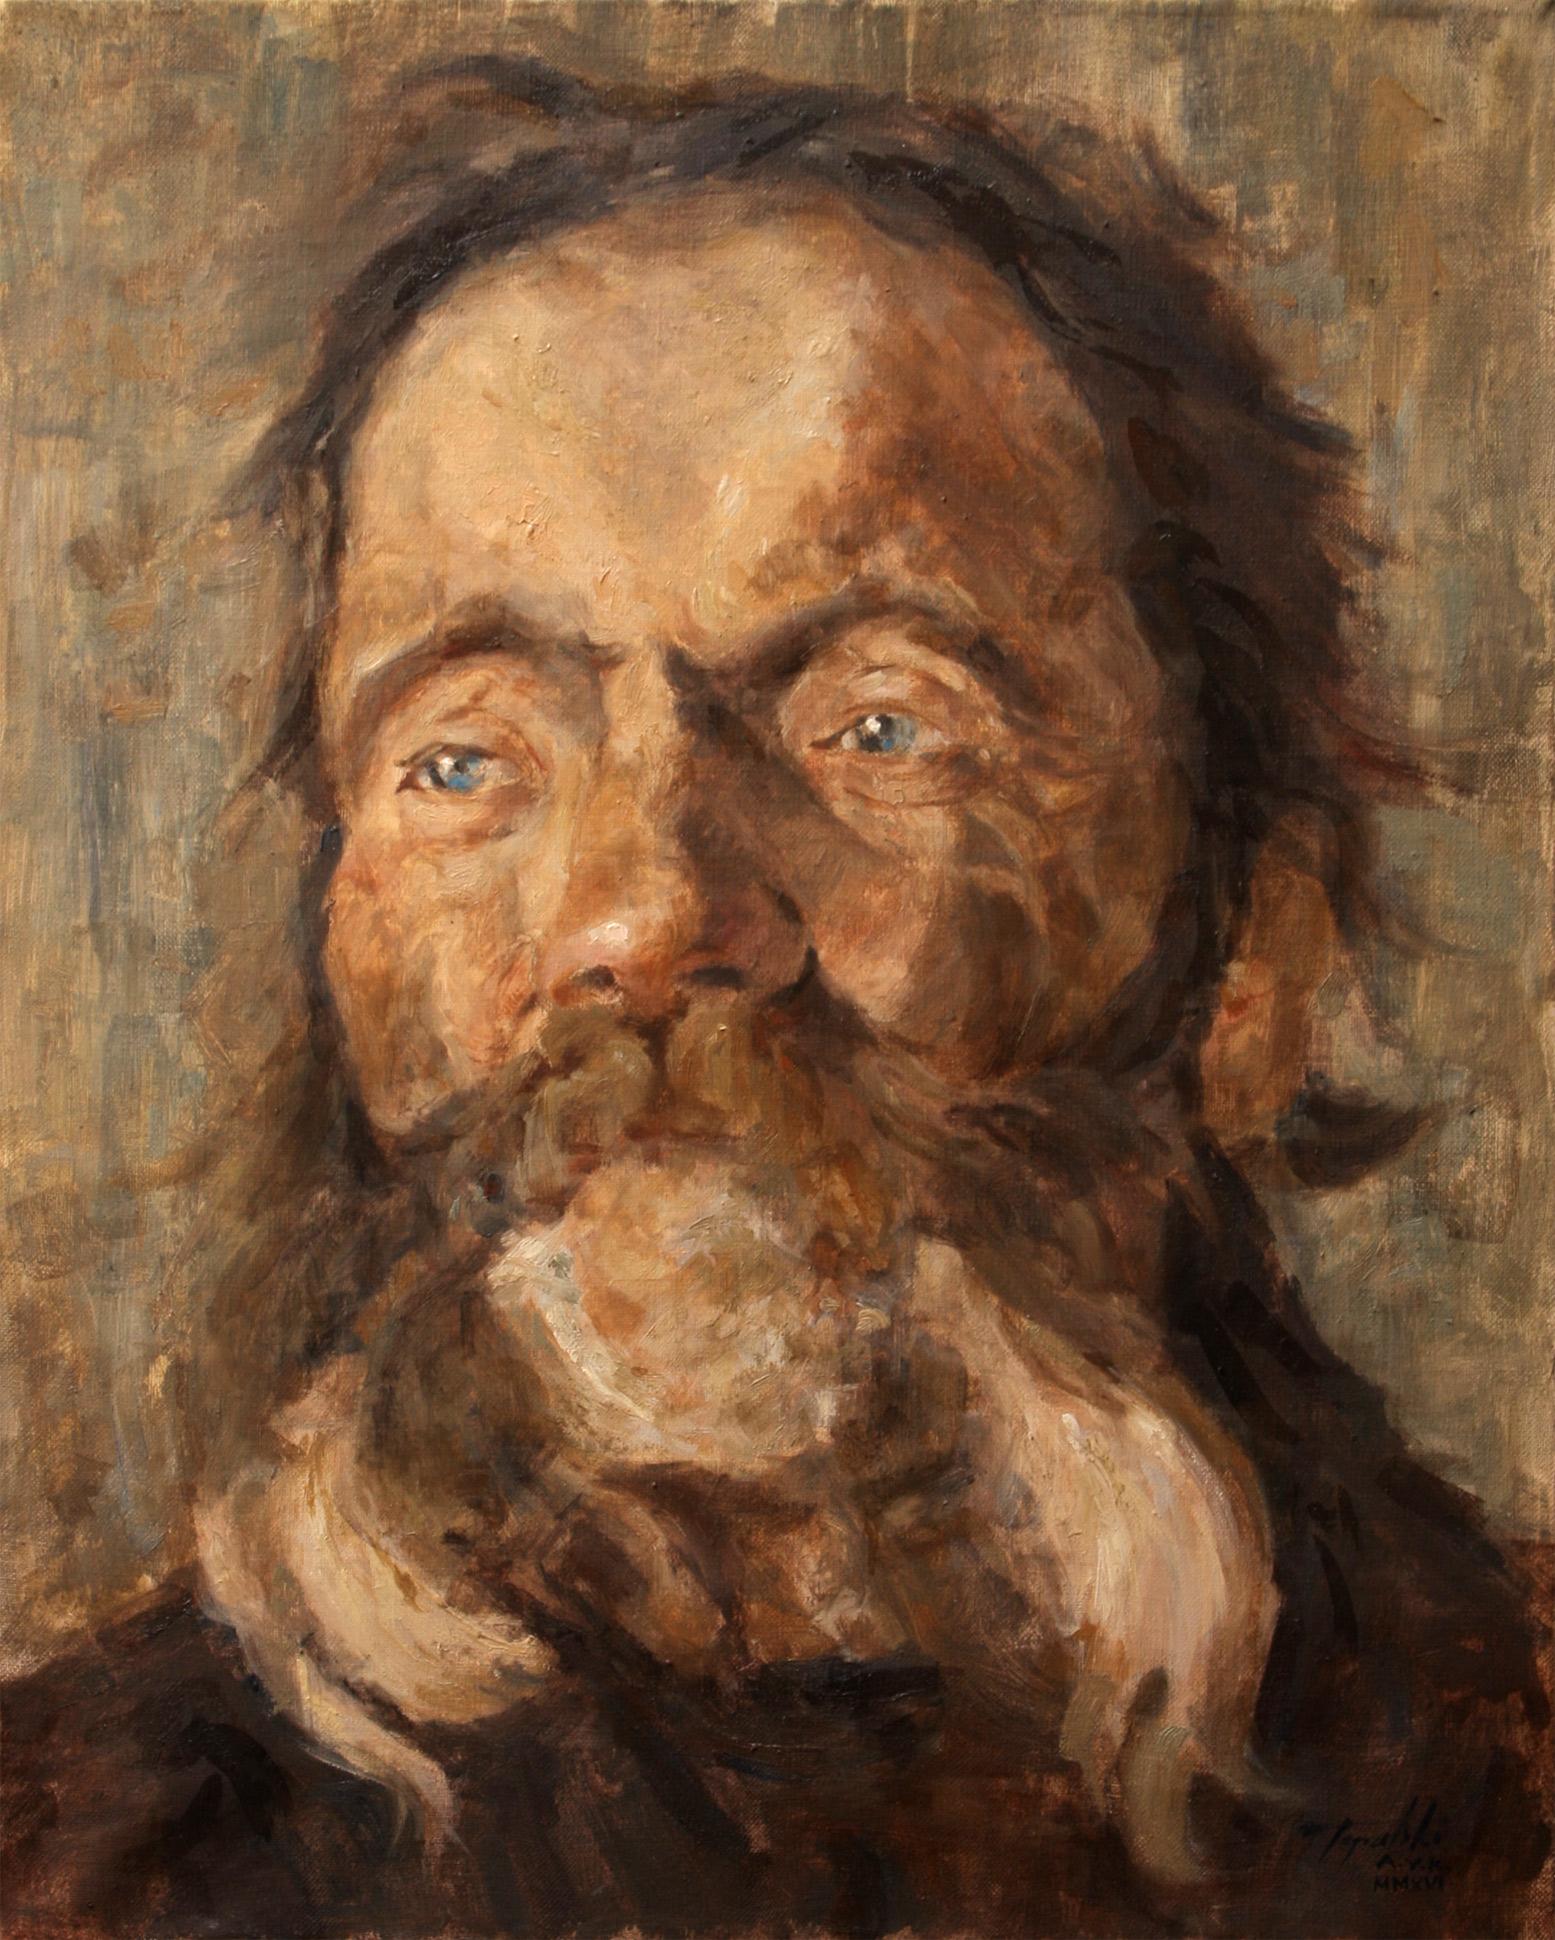 Umetnička Slika Portret Glava Starca - 50x40cm, Ulje nakon V. Kovačević